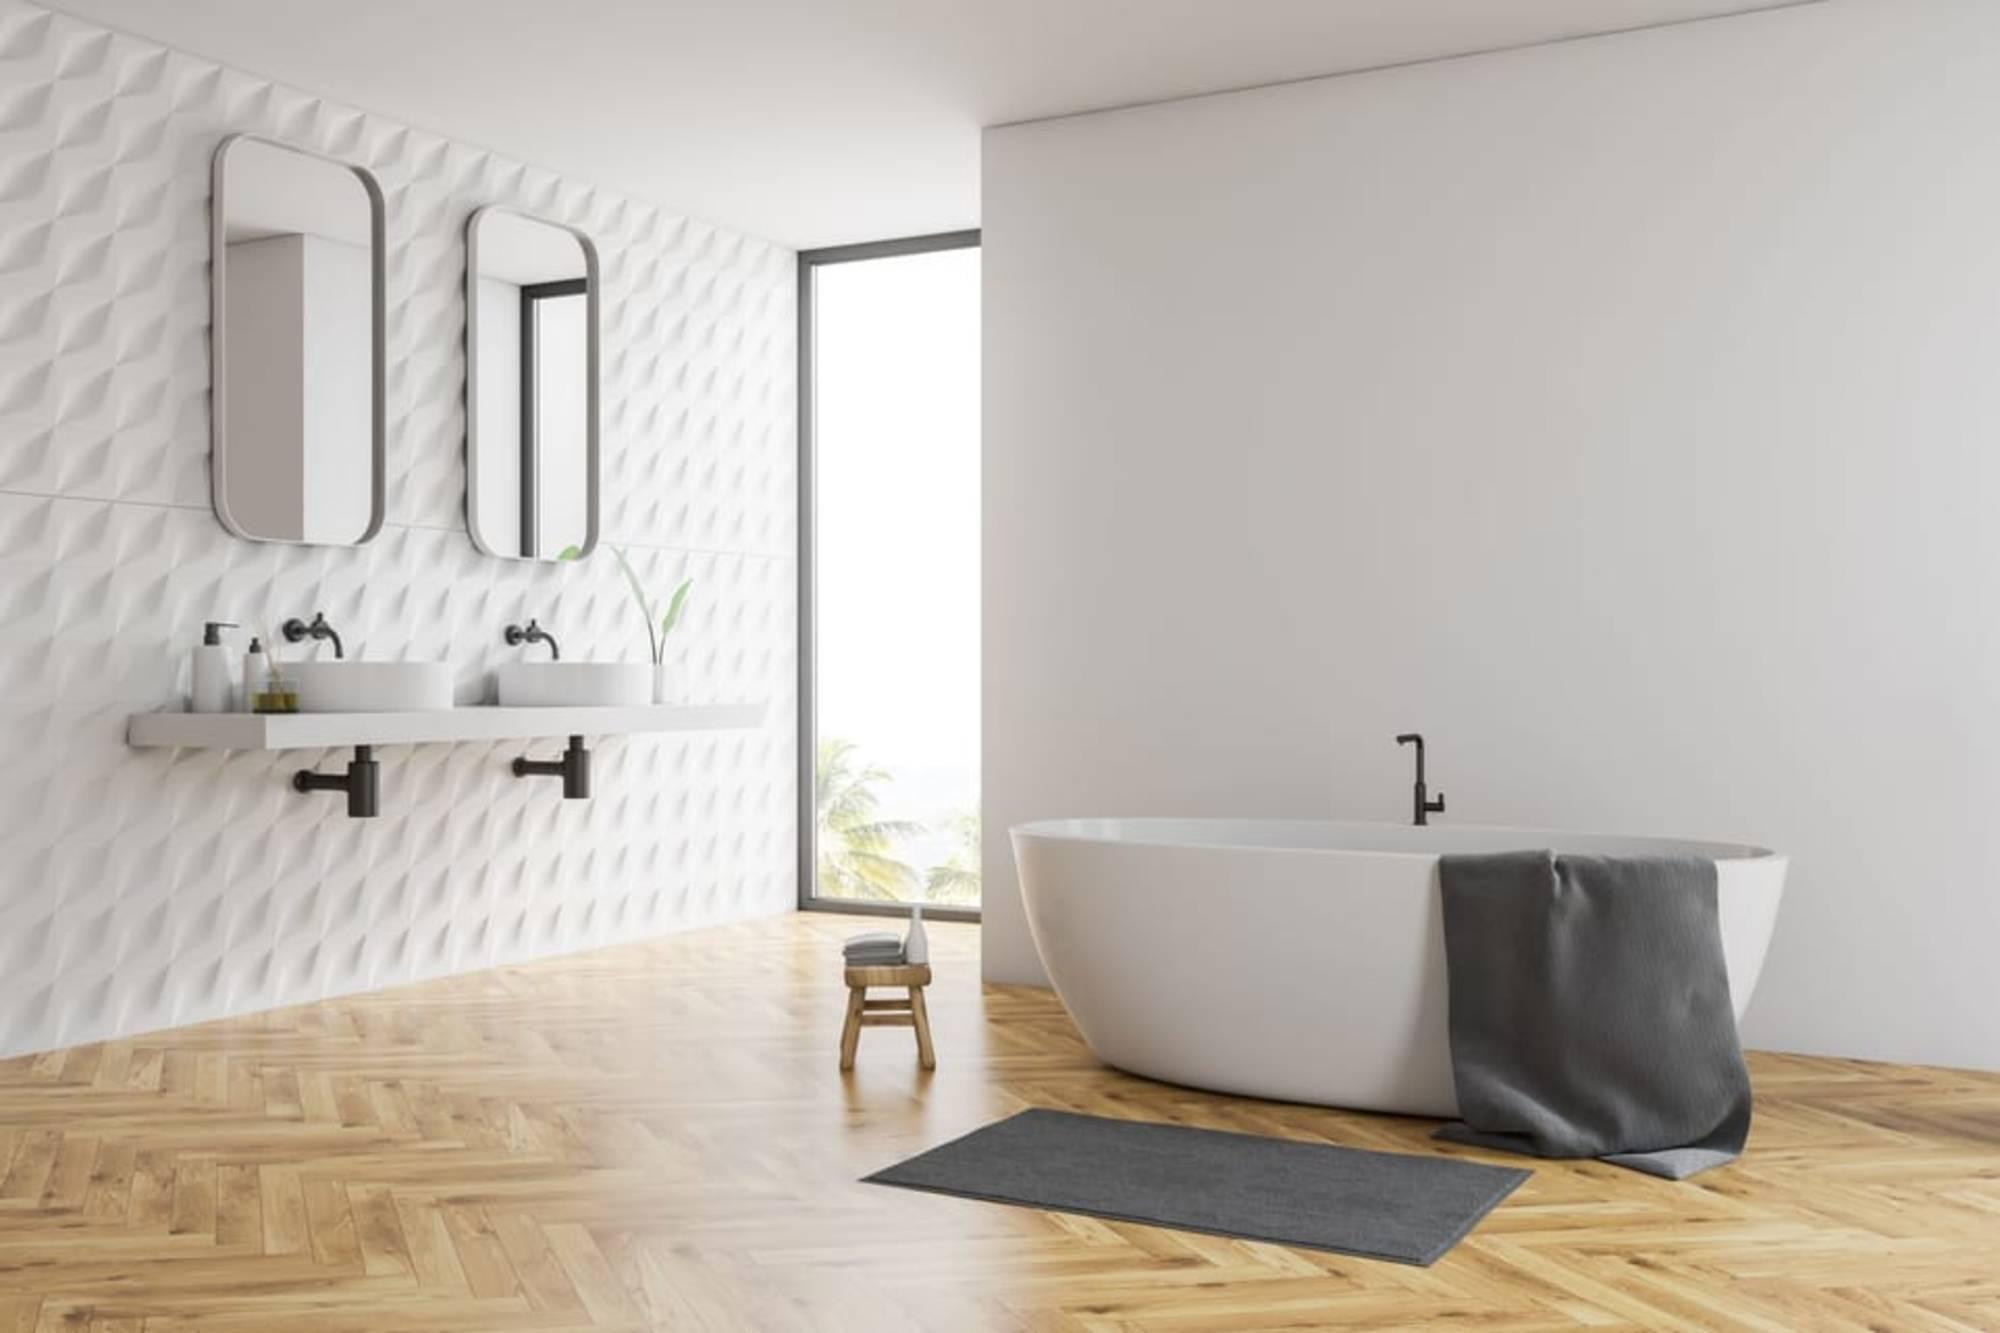 hout kurk vloer badkamer